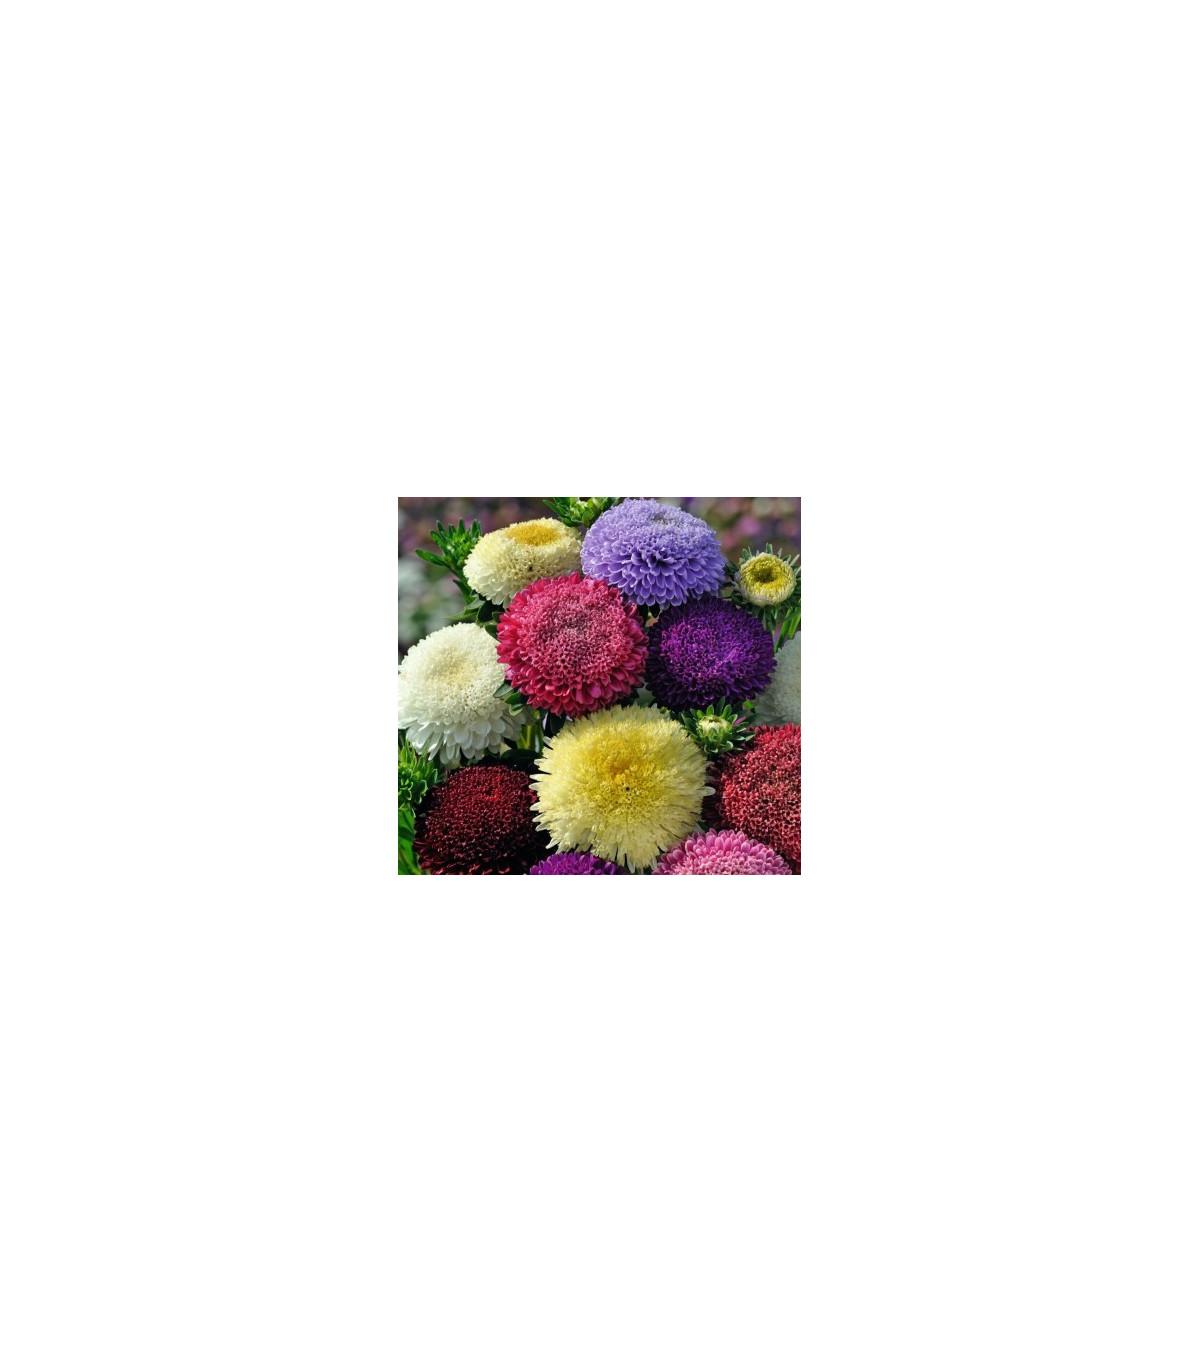 Astra čínská pomponkovitá směs barev - Calistephus chinensis - osivo astry - 80 ks